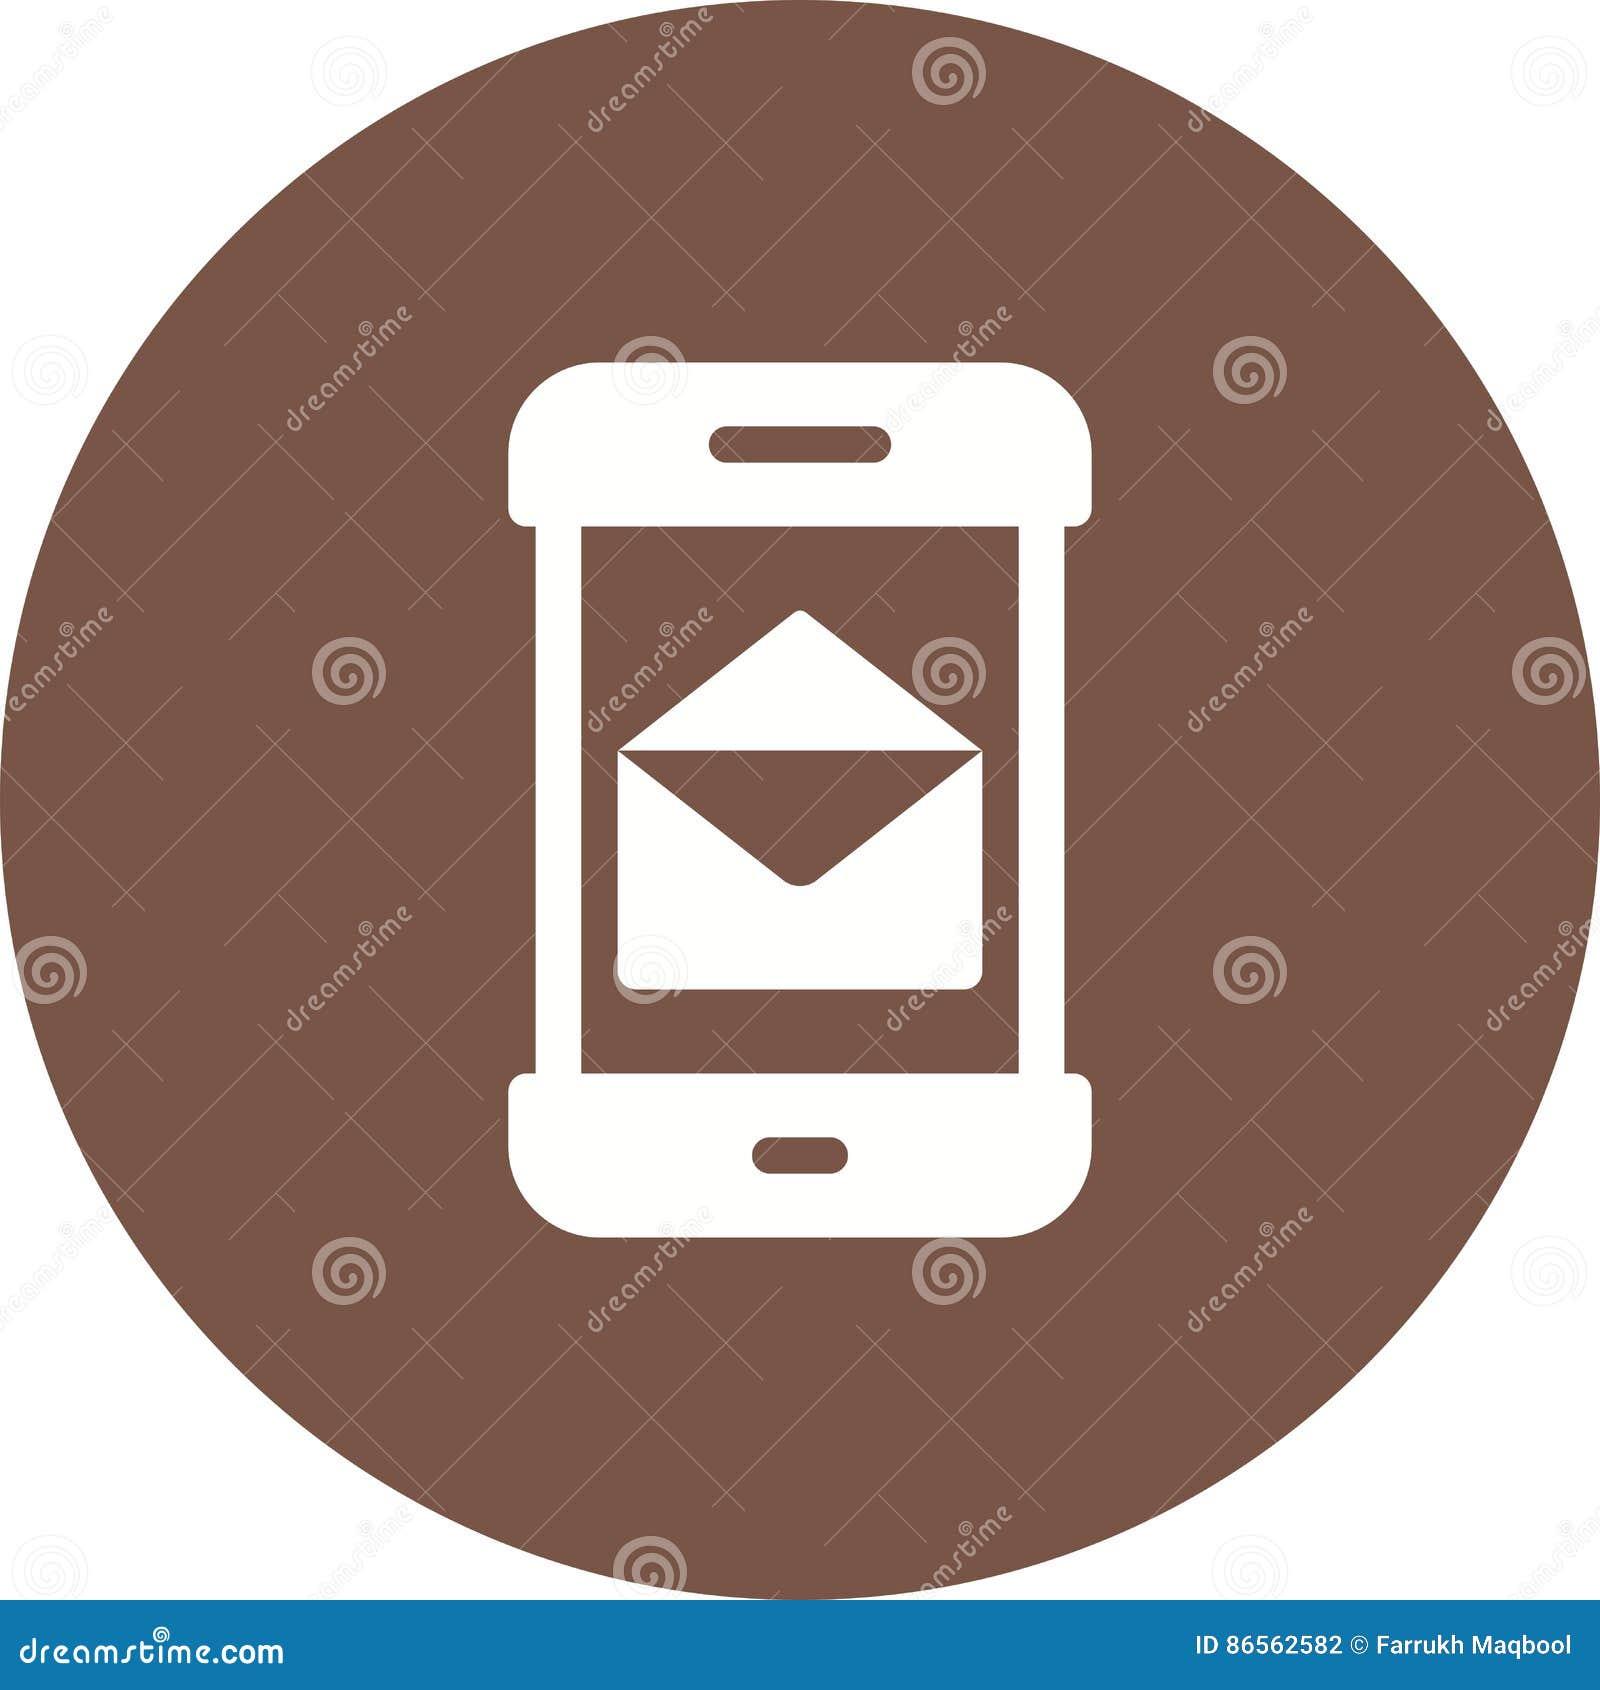 Messaging App stock vector  Illustration of envelope - 86562582